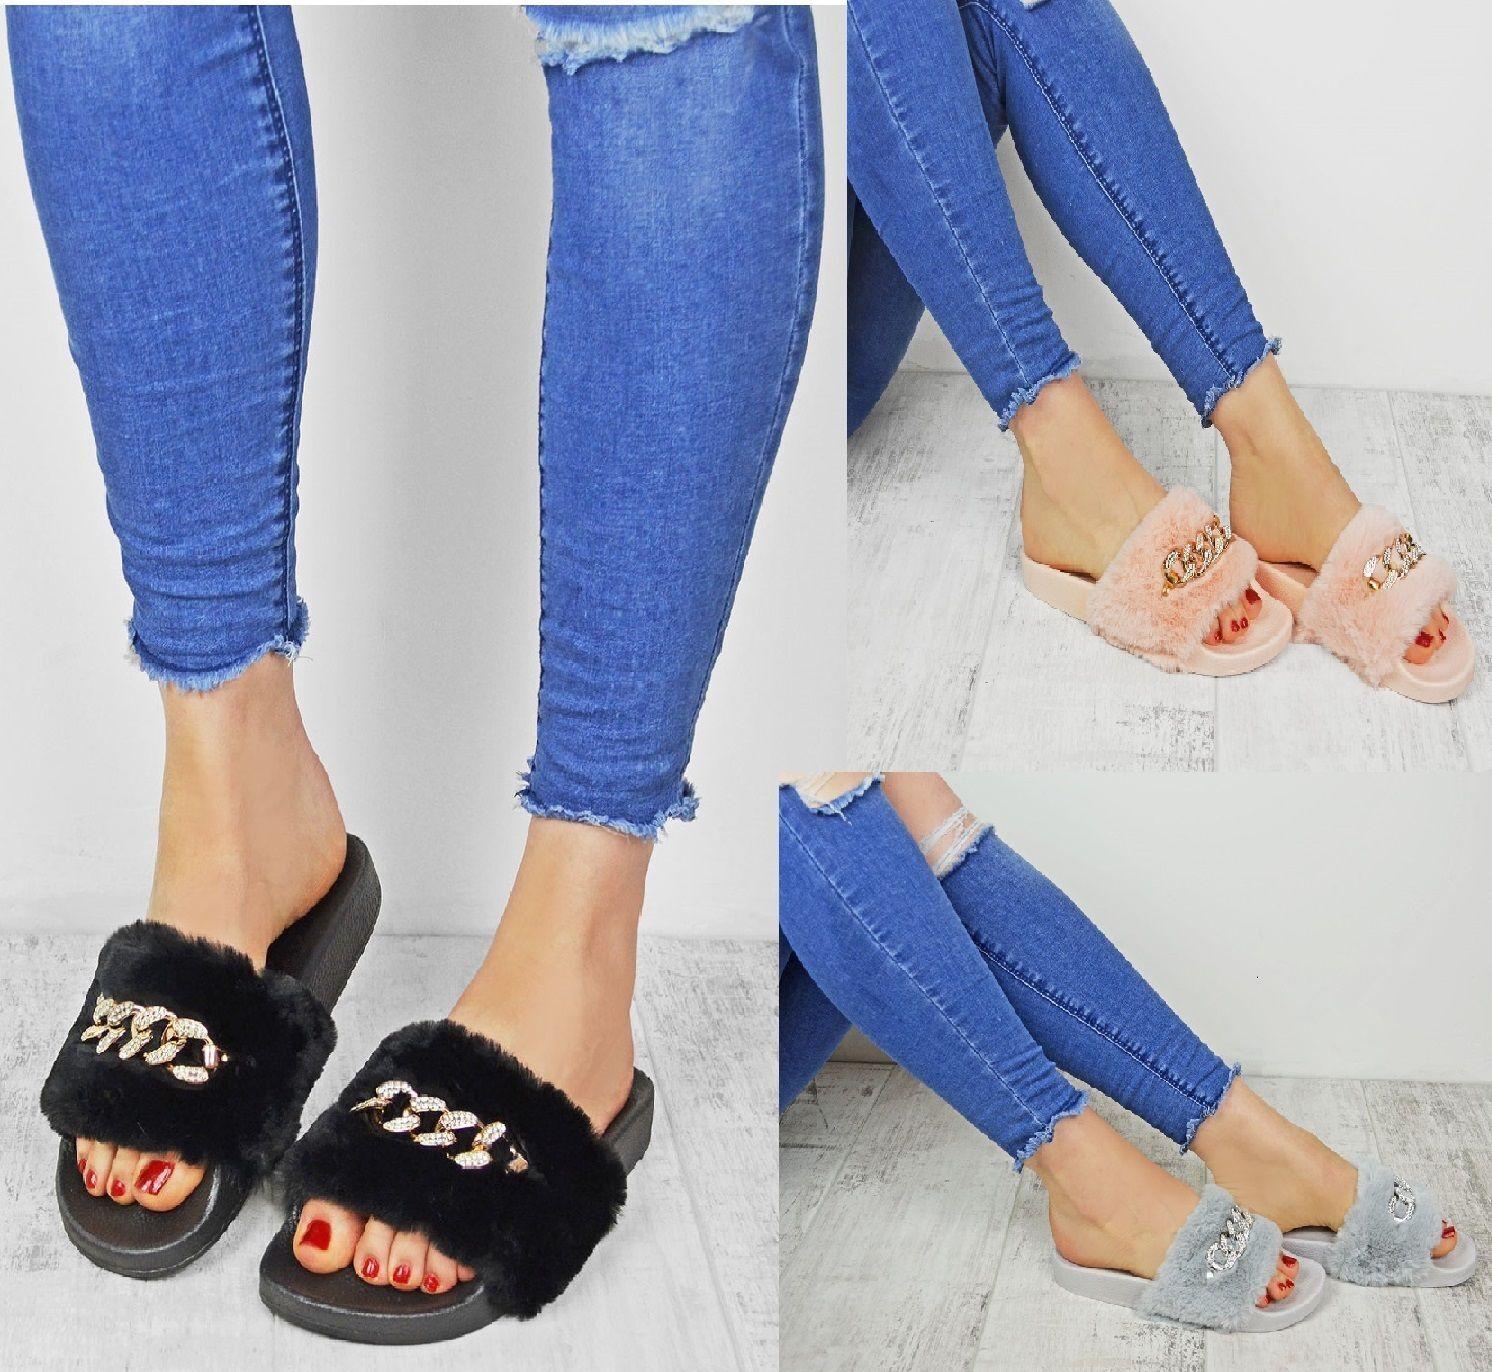 New On Women's Fur Diamante Chain Slider Slip On New Mule Sandals Slippers Shoes 9c9cfa